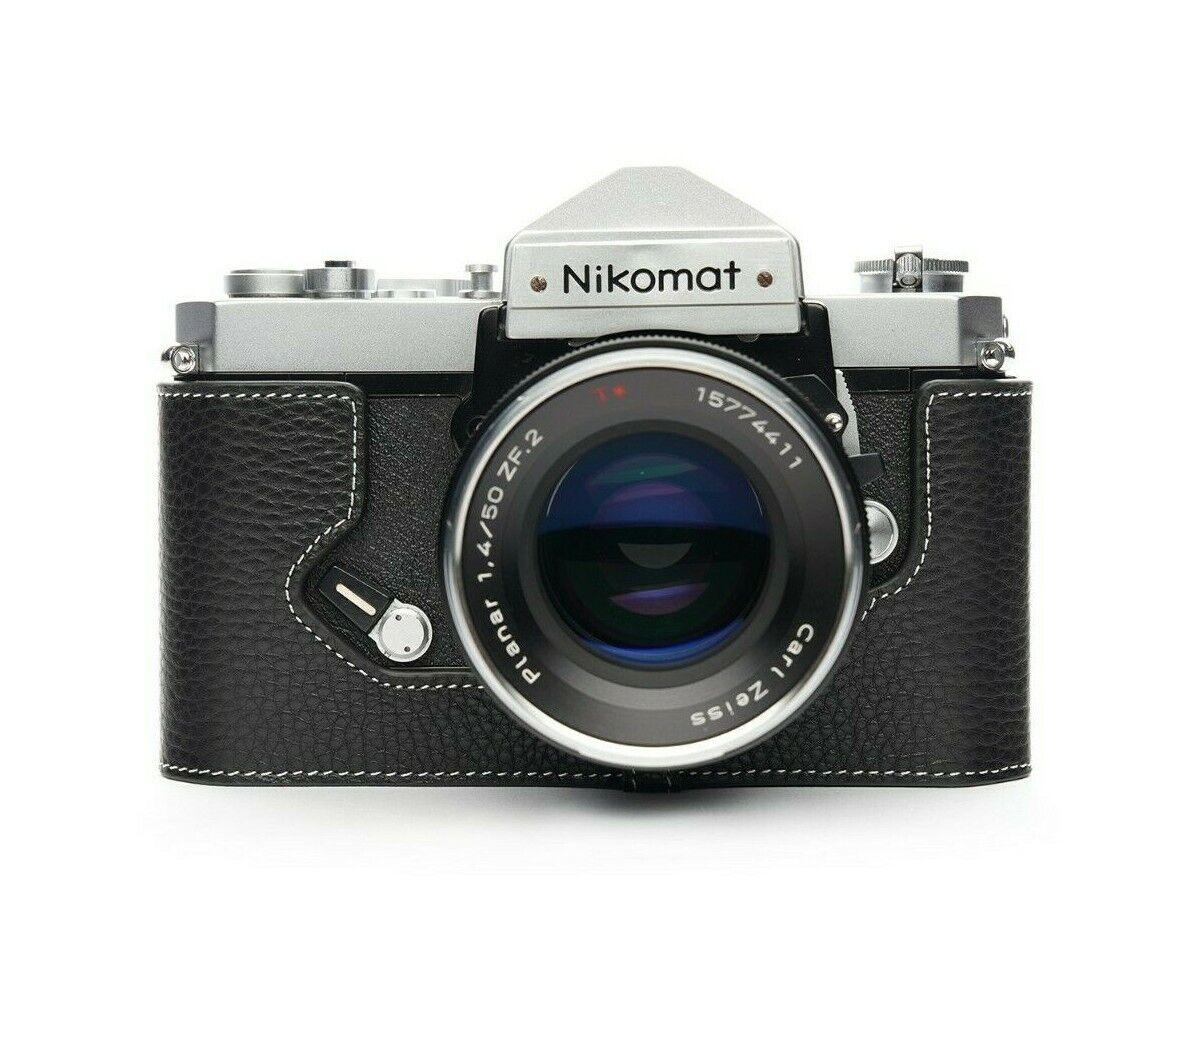 TP original camera half case for Nikomat FTN